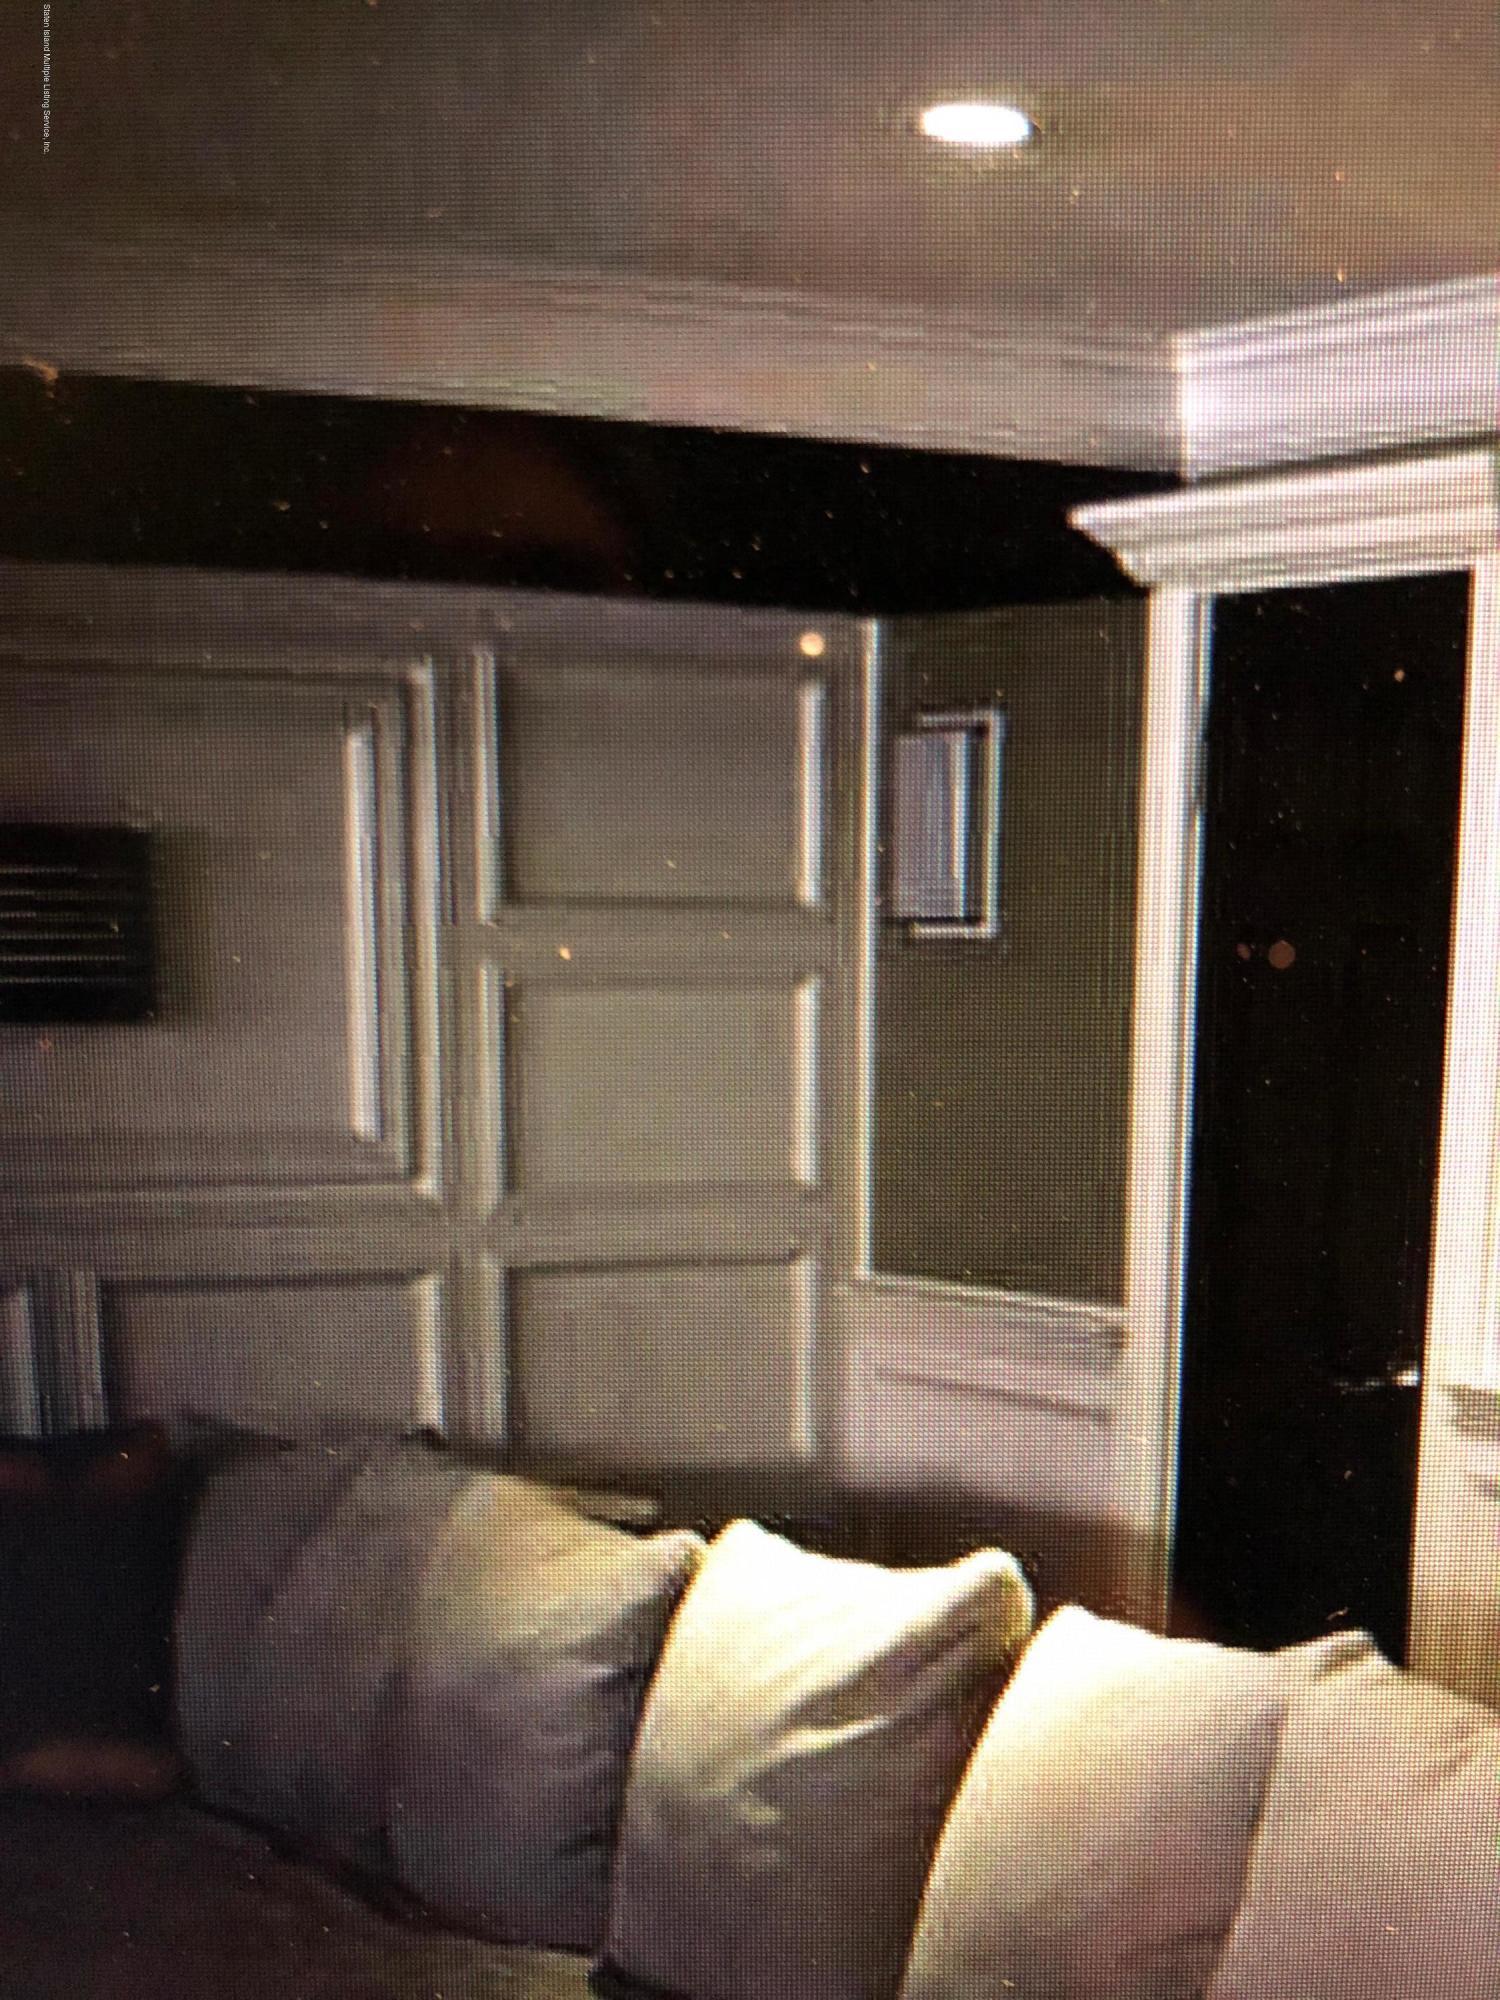 335 Green Valley Road,Staten Island,New York,10312,United States,3 Bedrooms Bedrooms,6 Rooms Rooms,3 BathroomsBathrooms,Residential,Green Valley,1122211